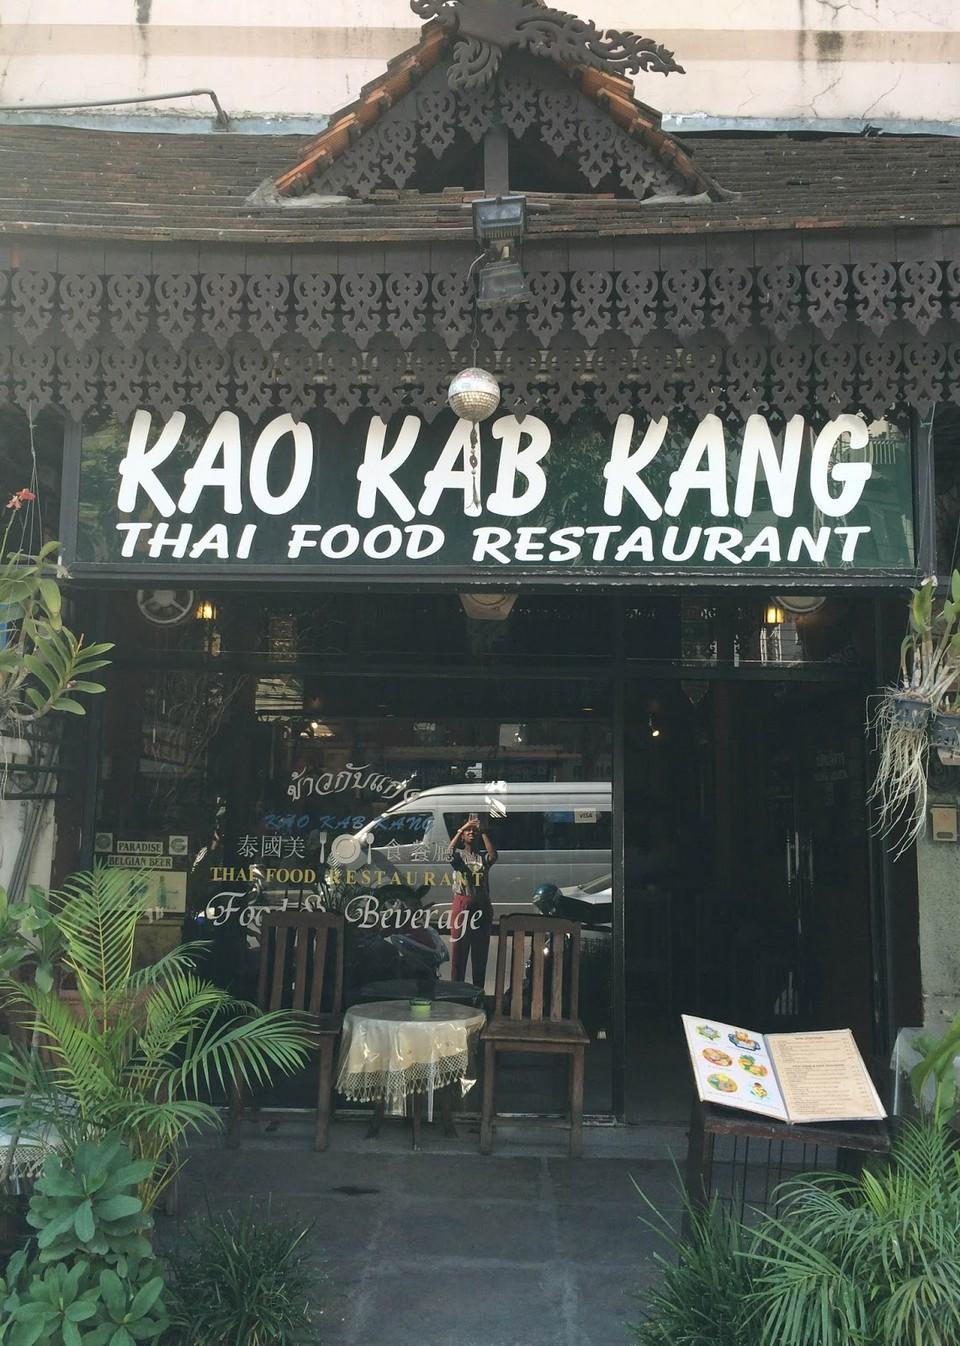 Kao Kab Kang-restaurant-chiangmai-thailand1 chiang mai night bazaar restaurants what to eat at chiang mai night bazaar